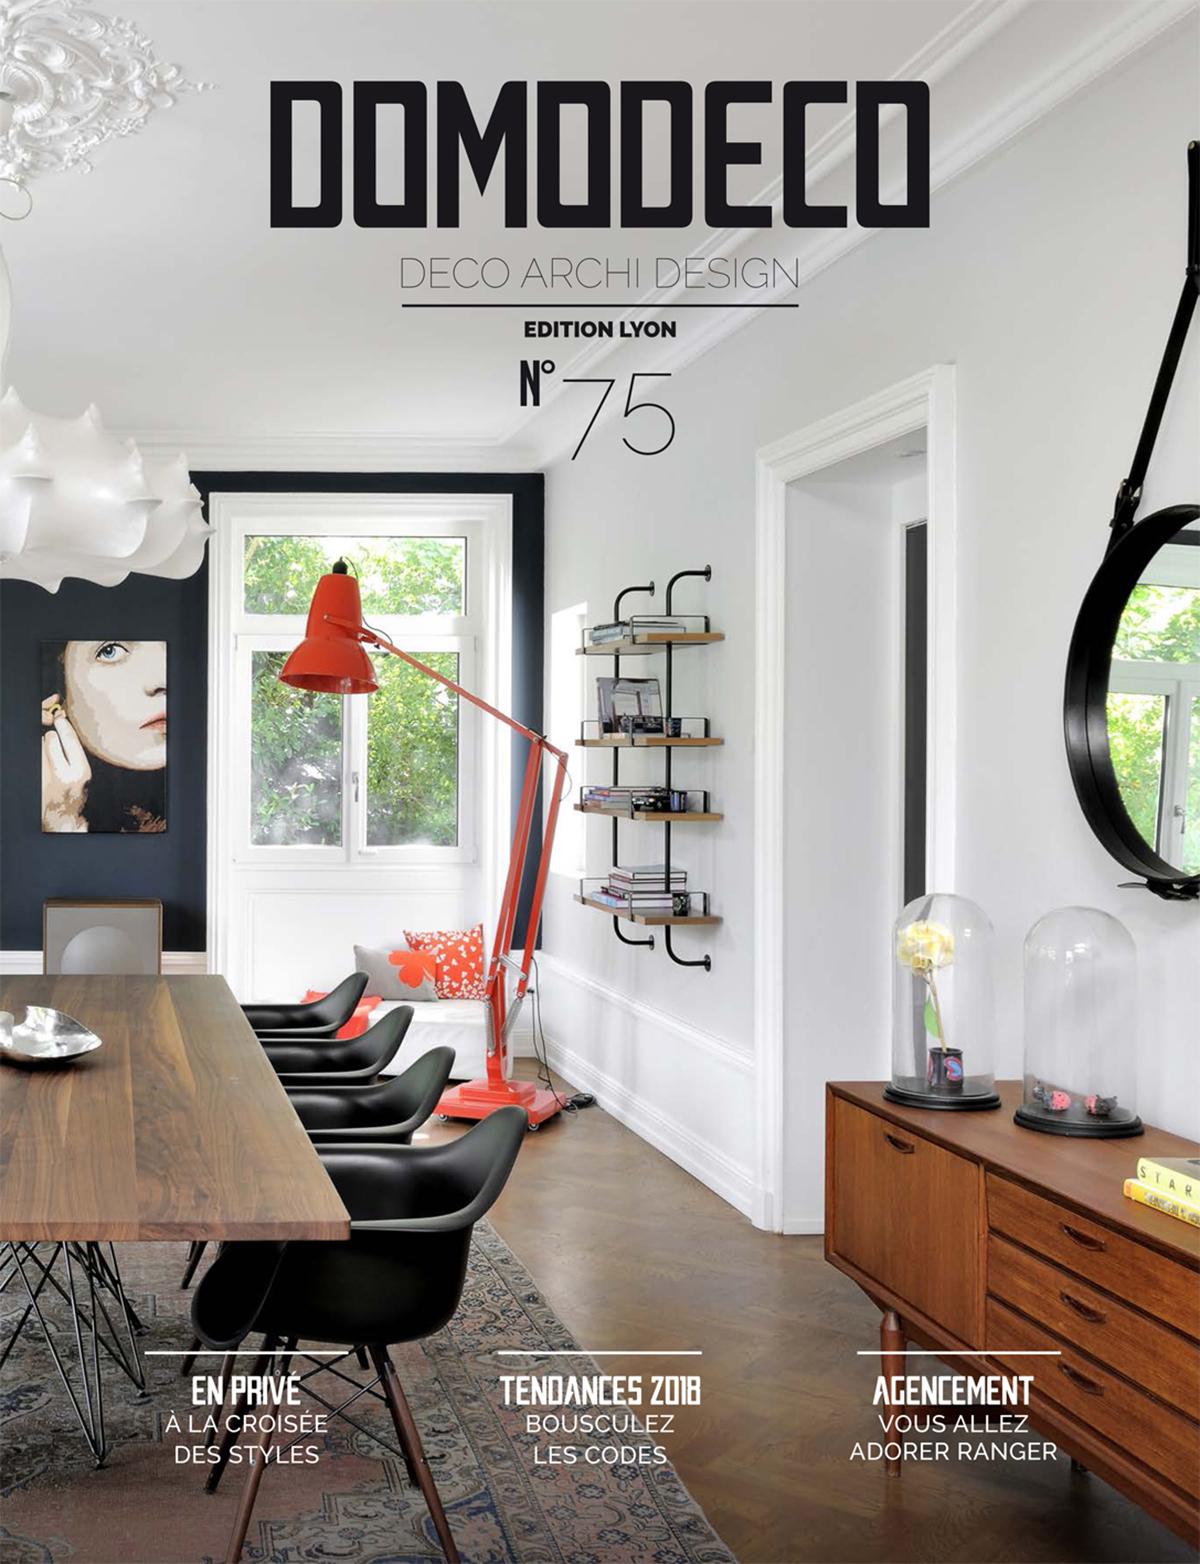 parutions domodeco claude cartier d coration. Black Bedroom Furniture Sets. Home Design Ideas